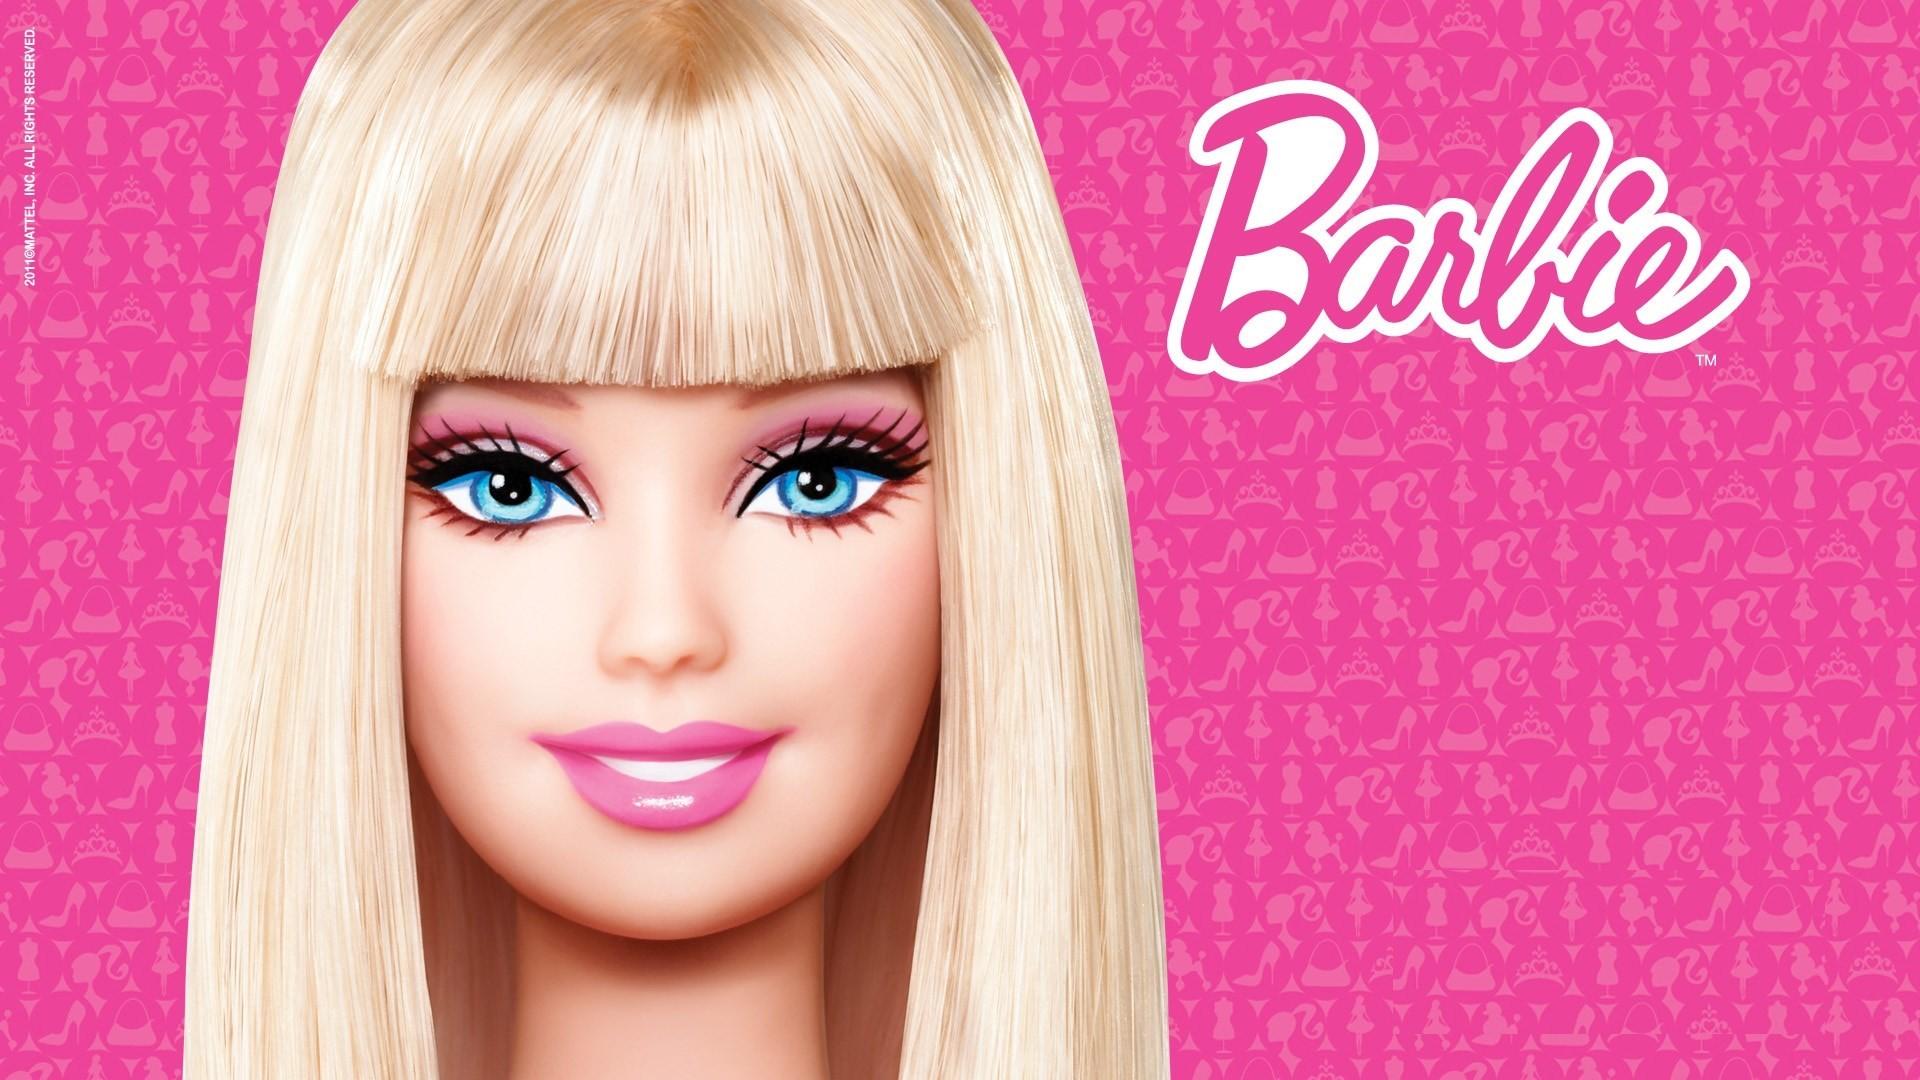 1920x1080 barbie wallpapers for mac desktop